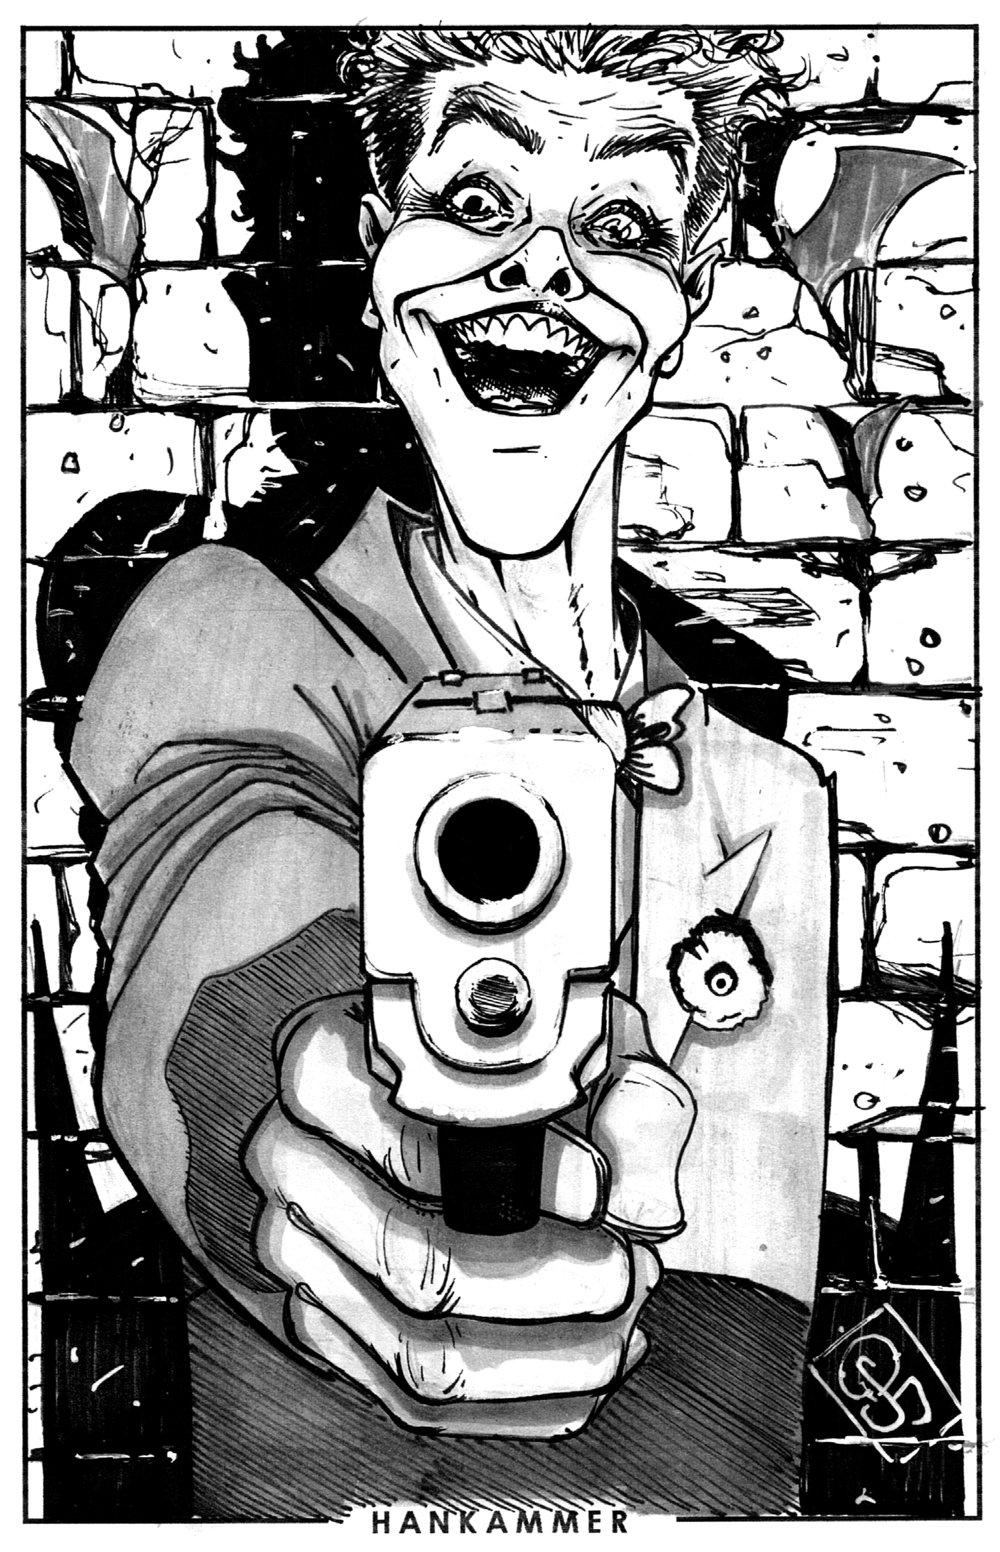 joker sketch.jpg